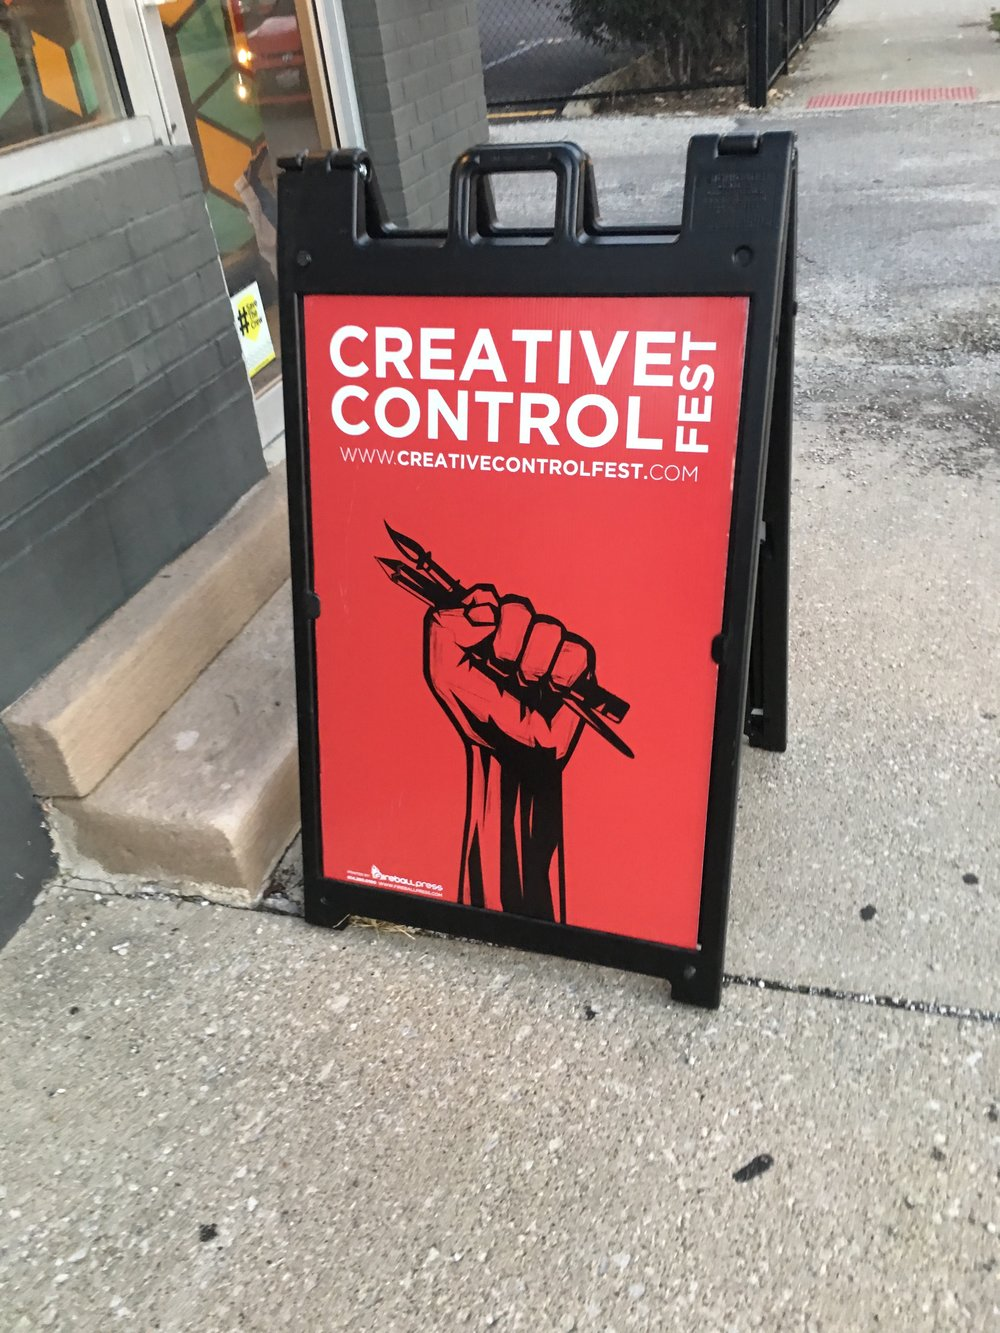 Creative Control Fest